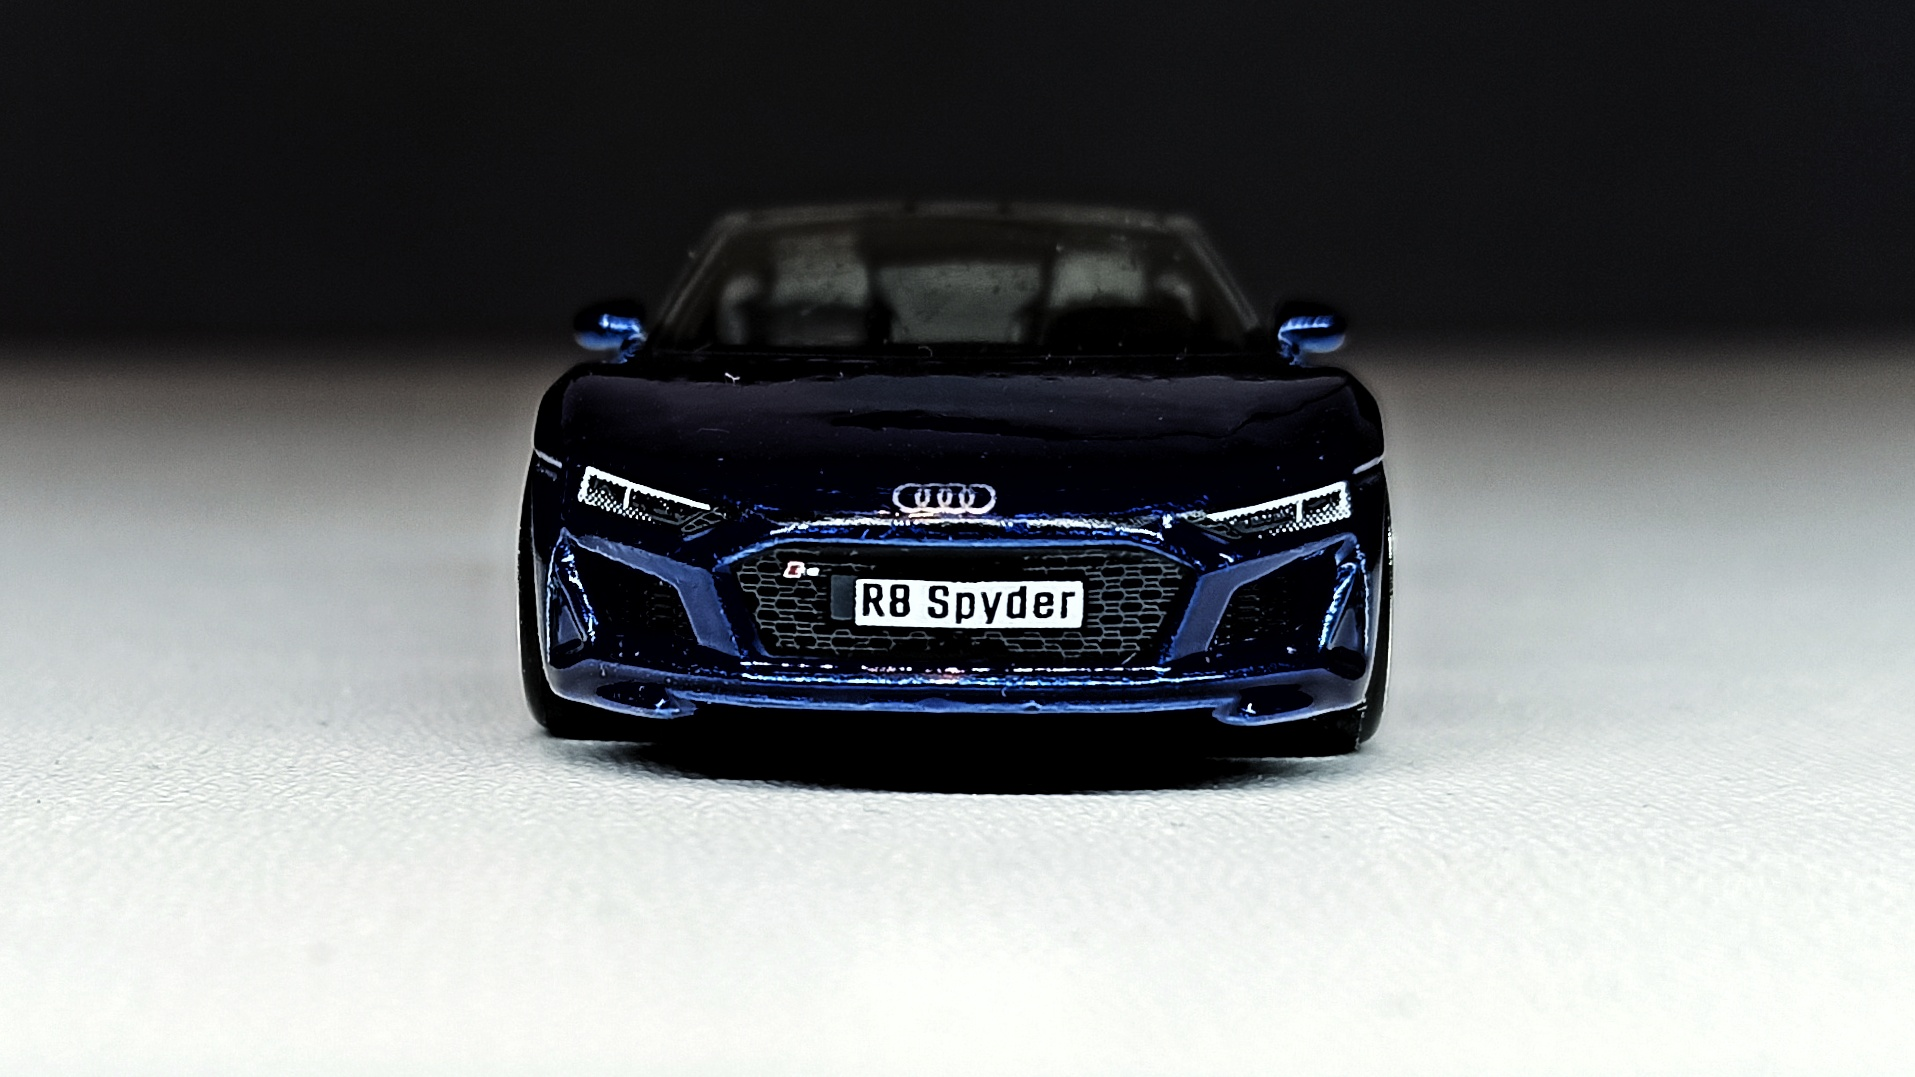 Hot Wheels 2019 Audi R8 Spyder 2021 (211/250) HW Exotics (4/10) indigo blue Super Treasure Hunt (STH) front